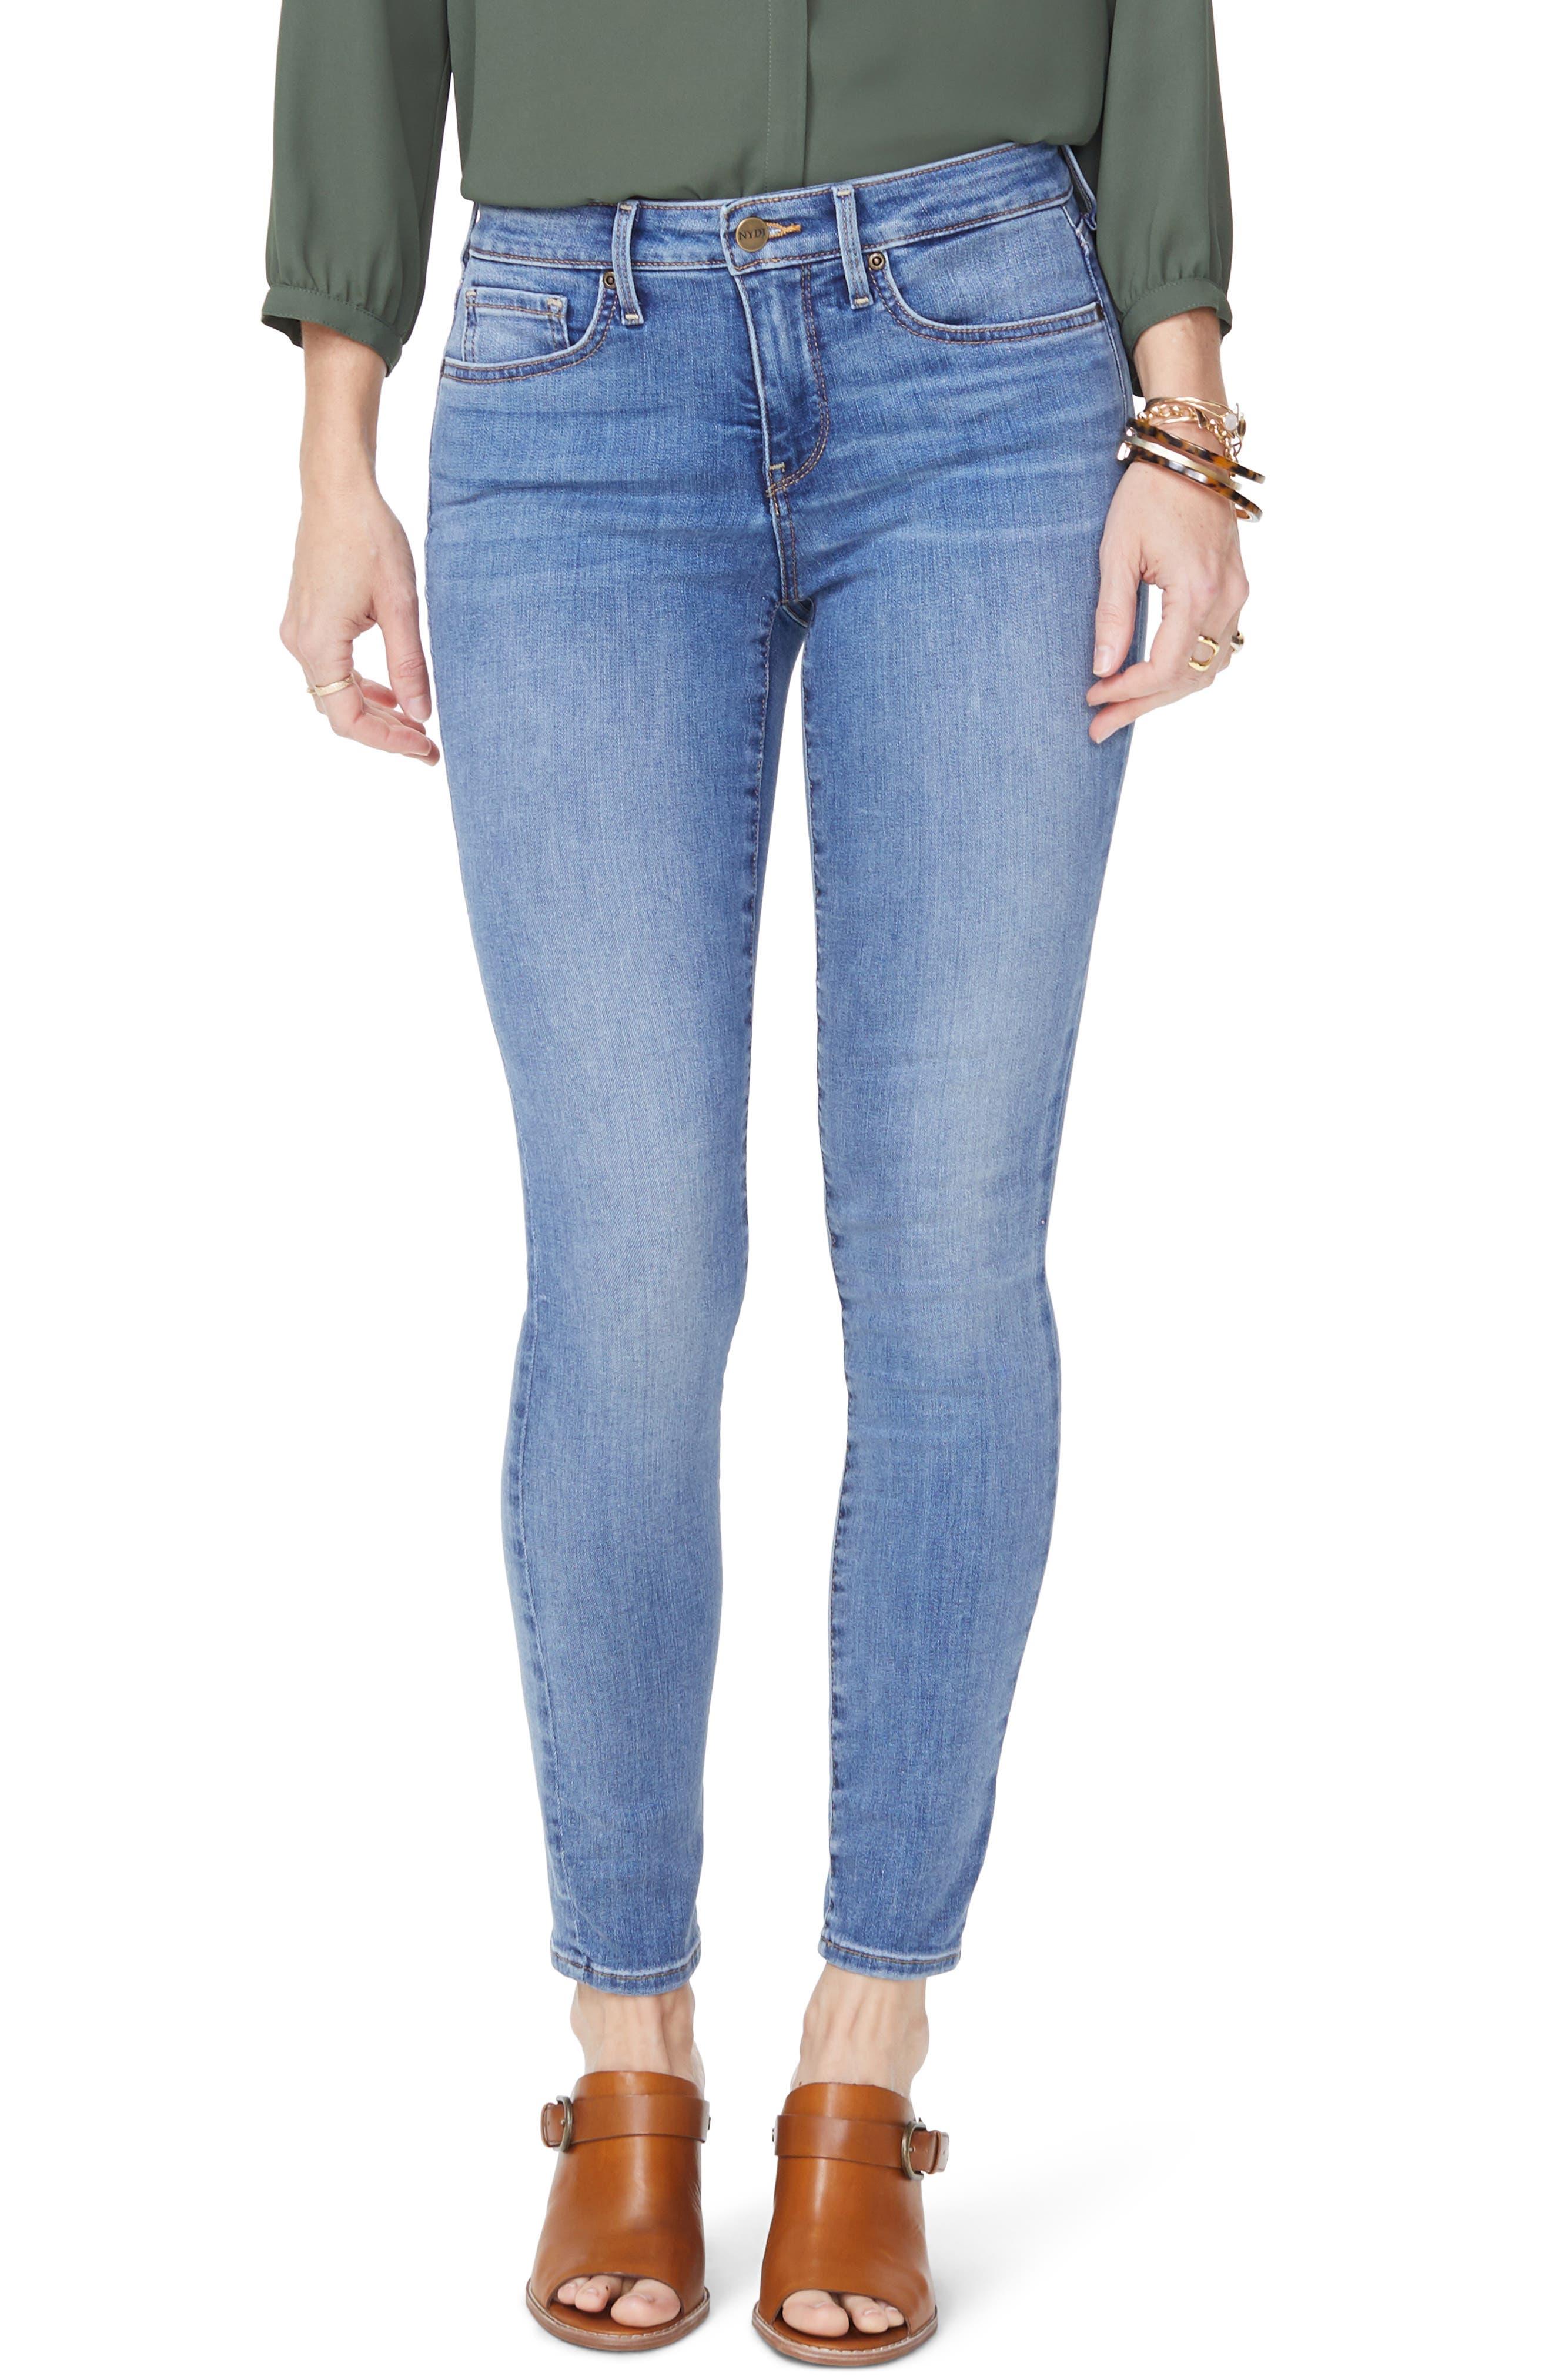 Petite Women's Nydj Ami Super Skinny Jeans,  18P - Blue